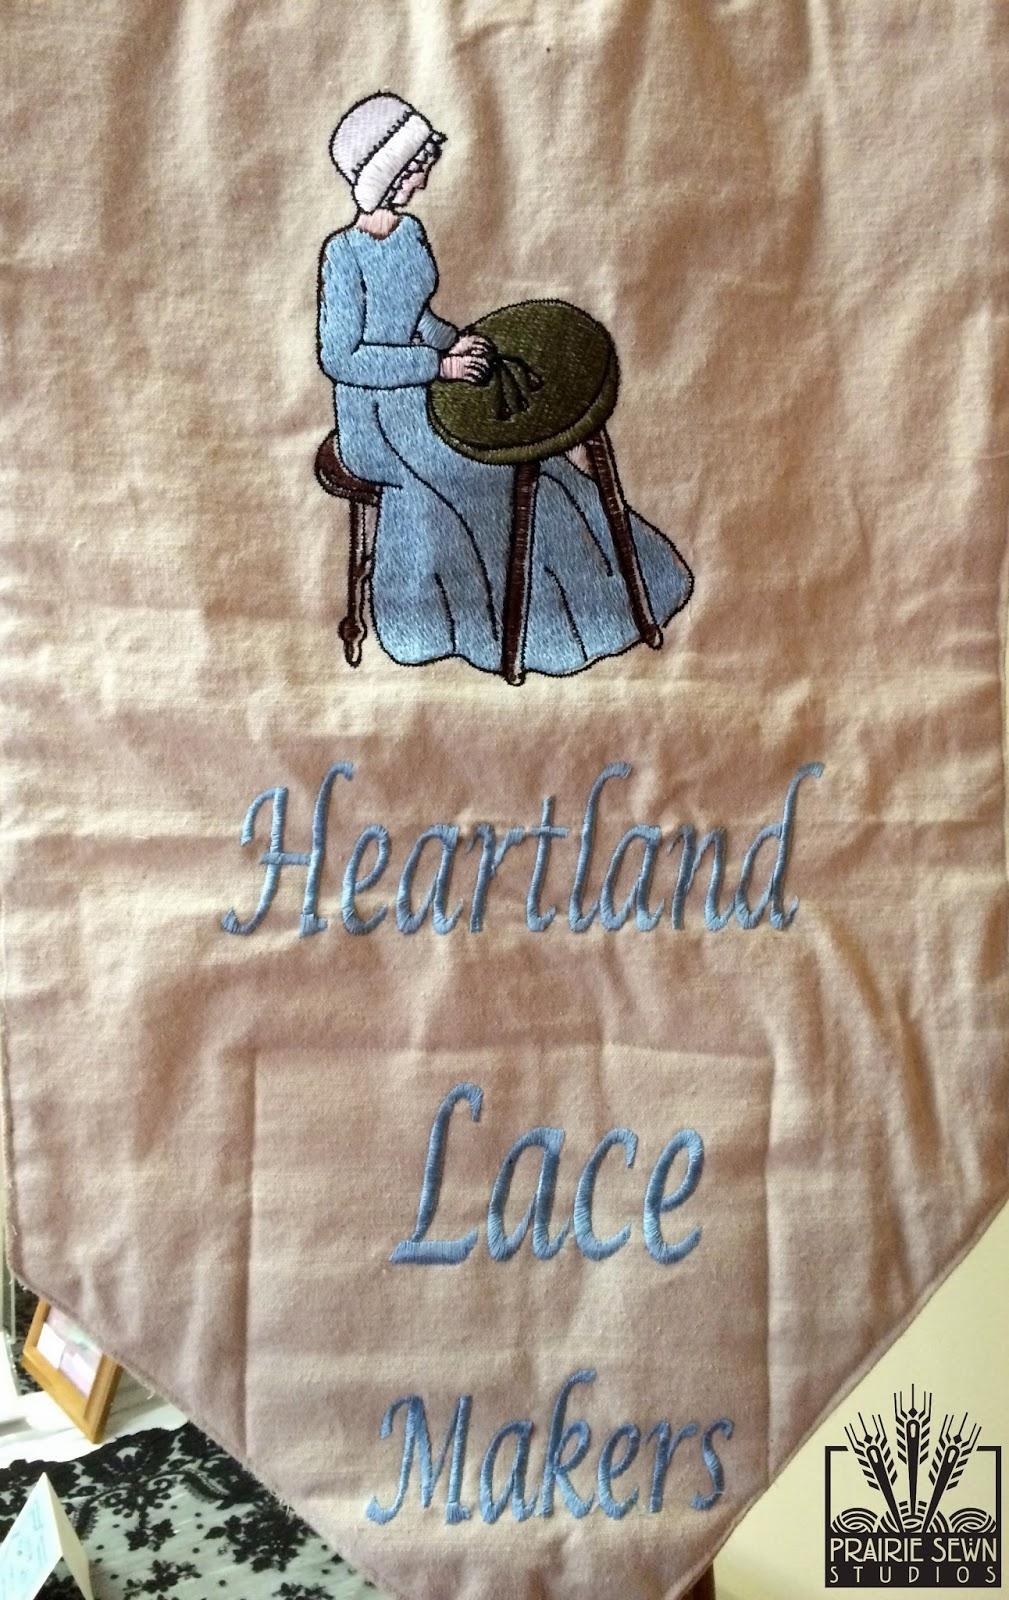 Heartland Lace Guild